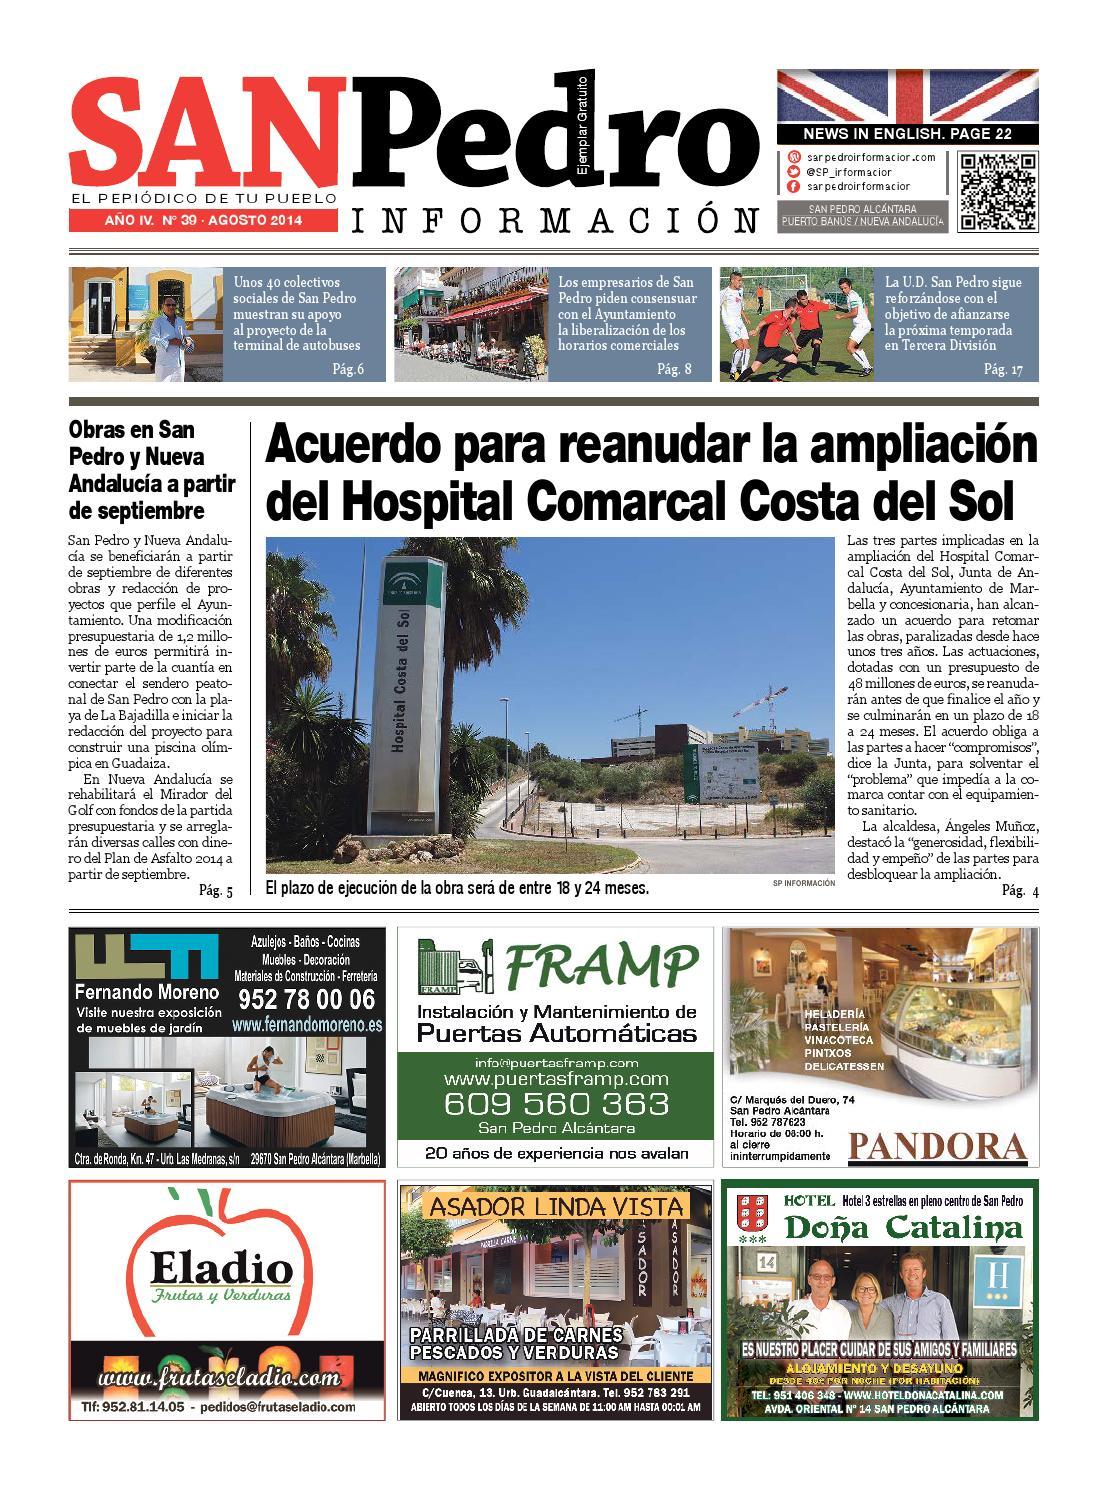 Spi agosto 2014 by San Pedro Informacion - issuu